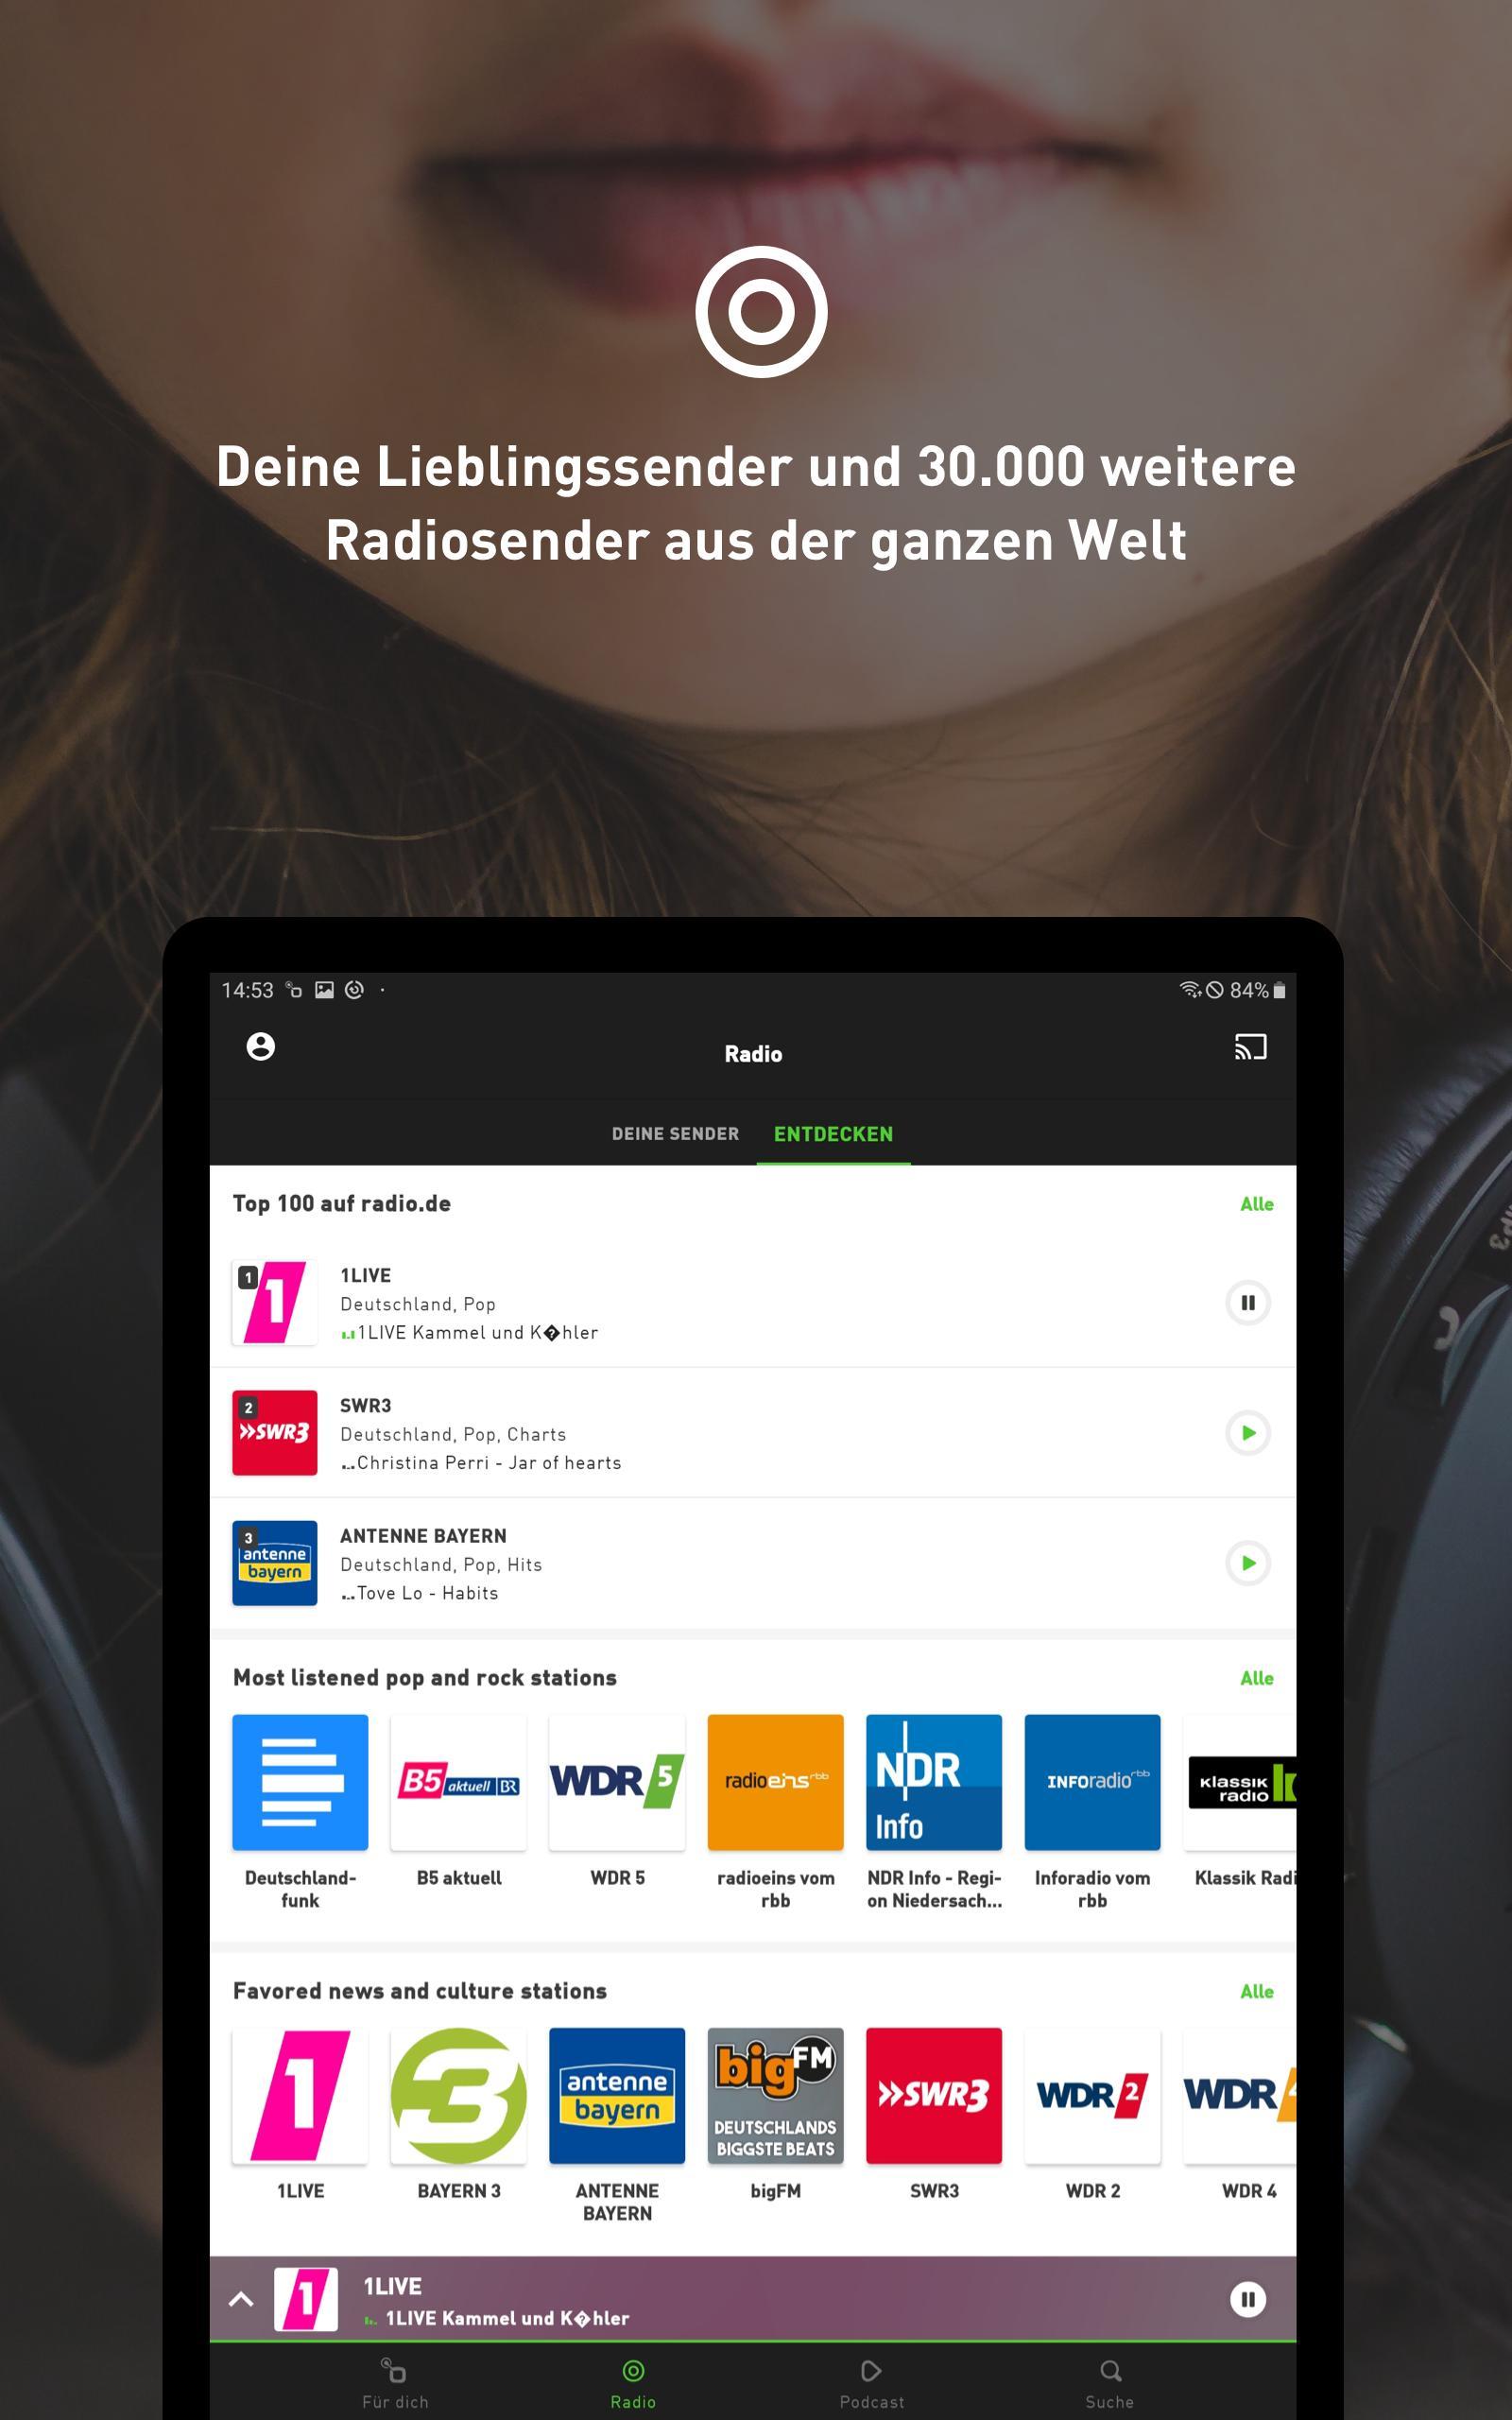 Swr3 Webradio Link